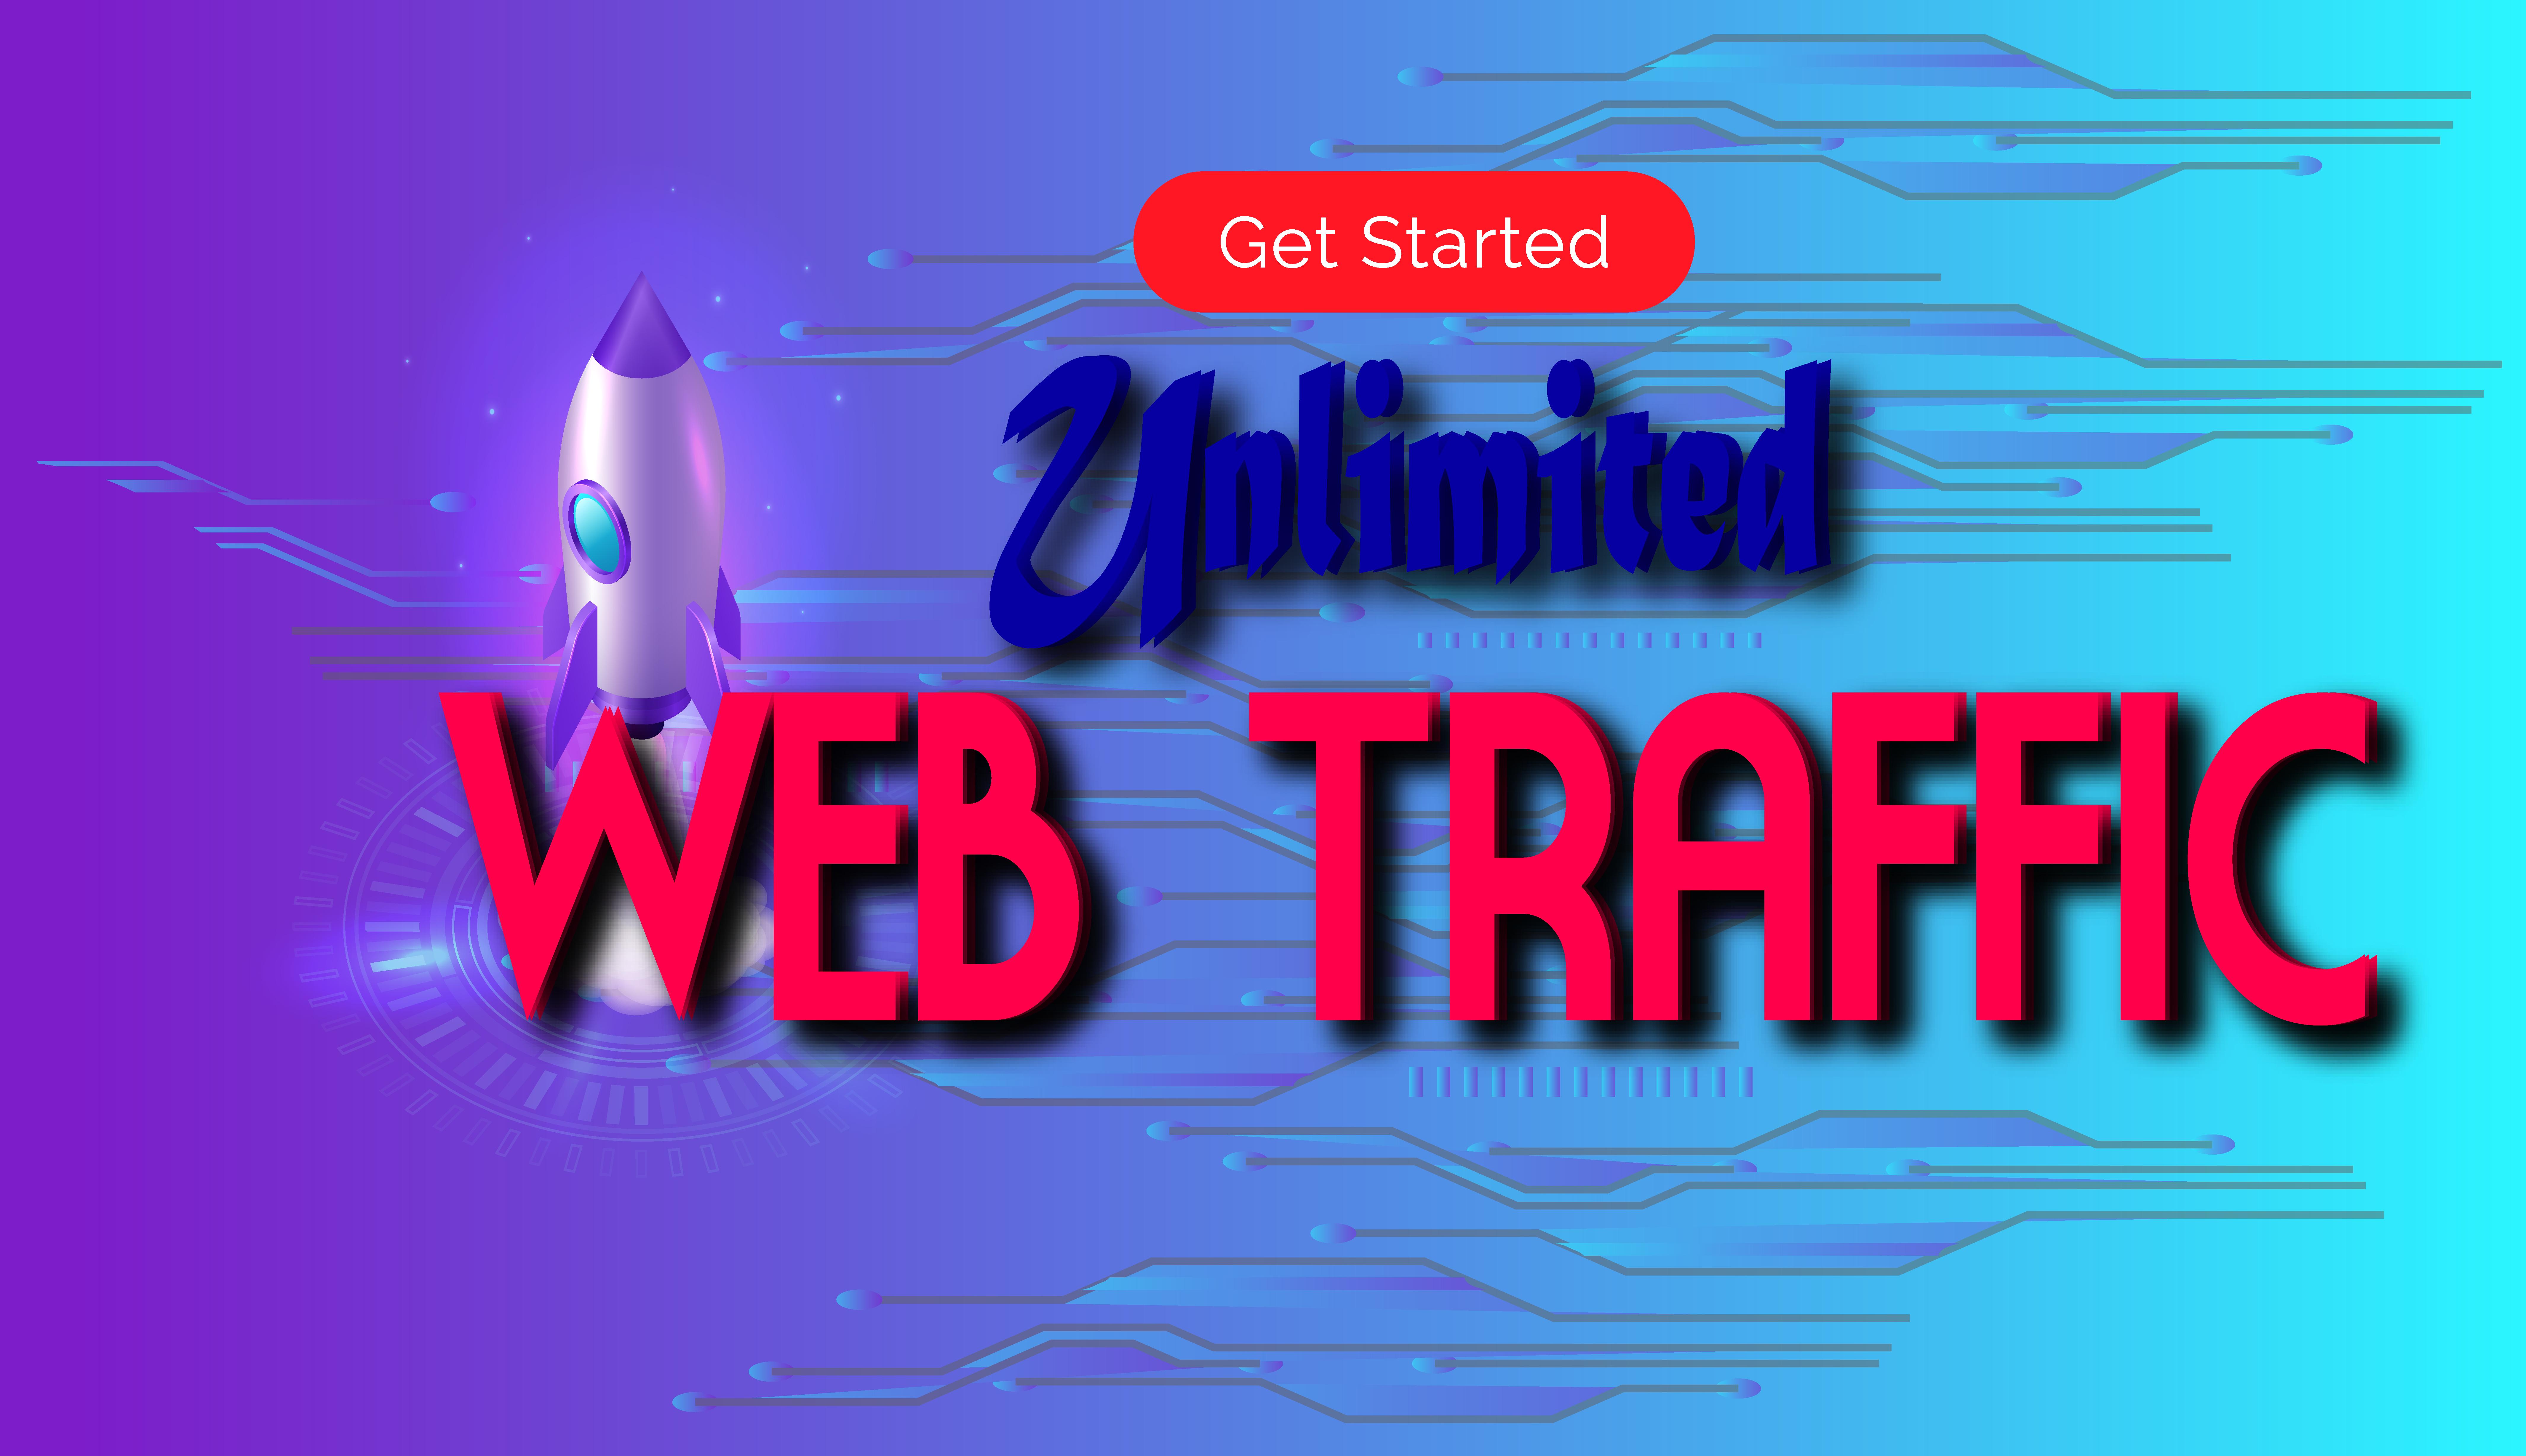 I will drive unlimited genuine web traffic 15 DAYS